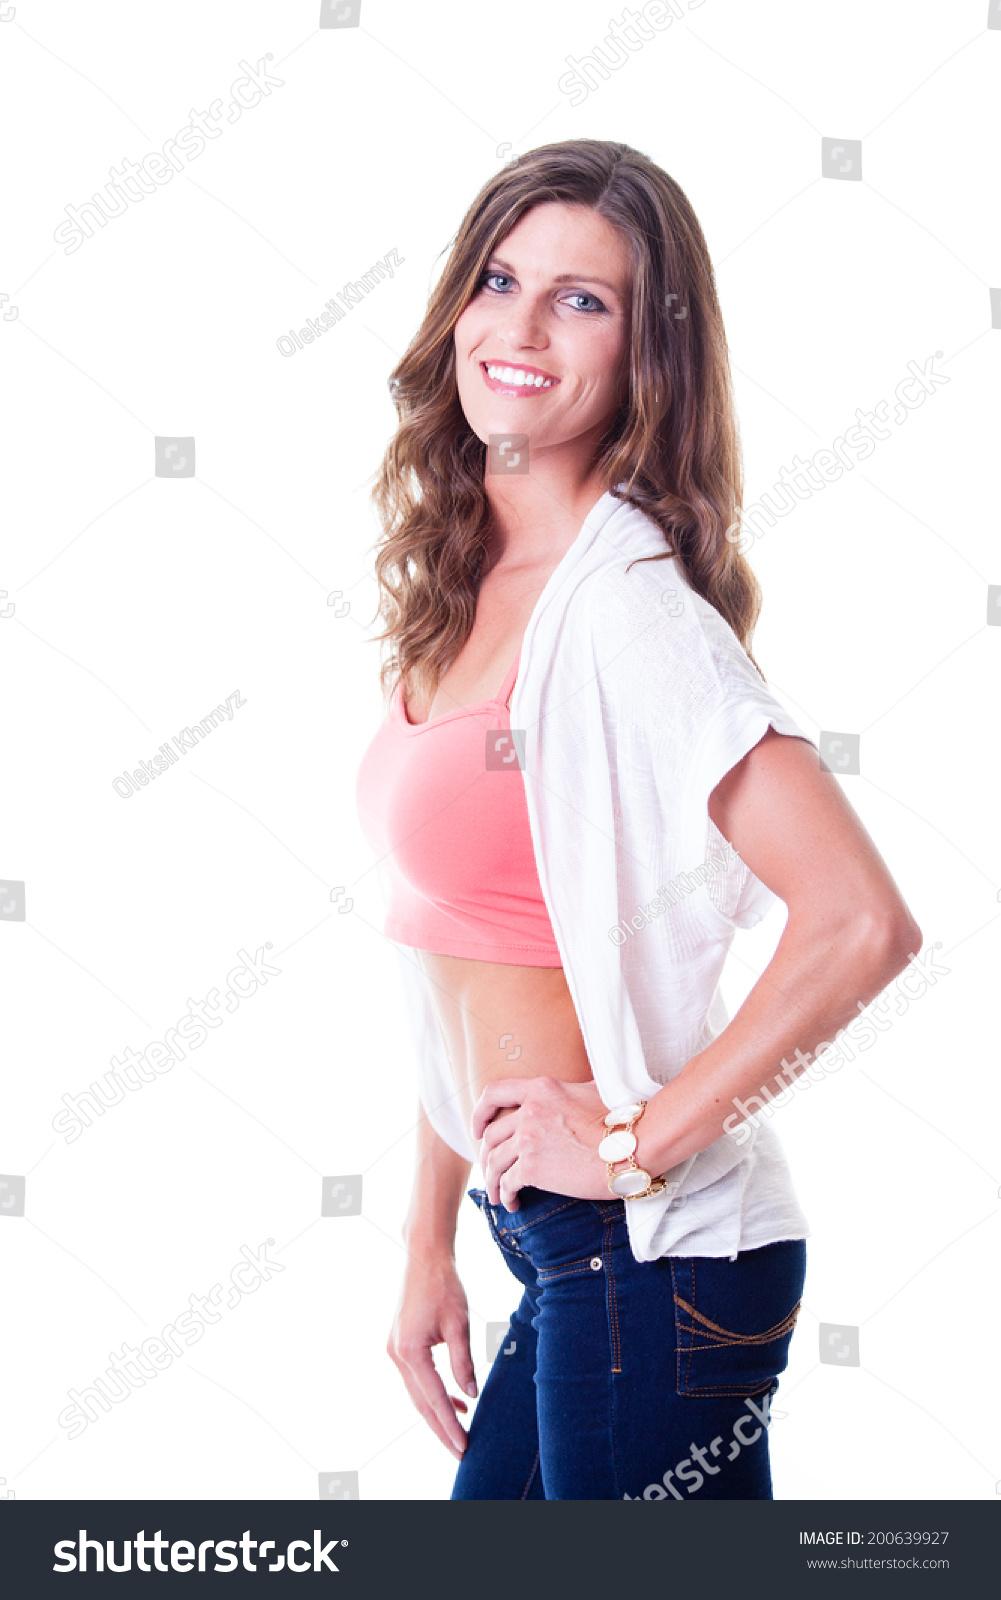 Beautiful Woman Jeans Pink Top Studio Stock Photo 200639927 - Shutterstock